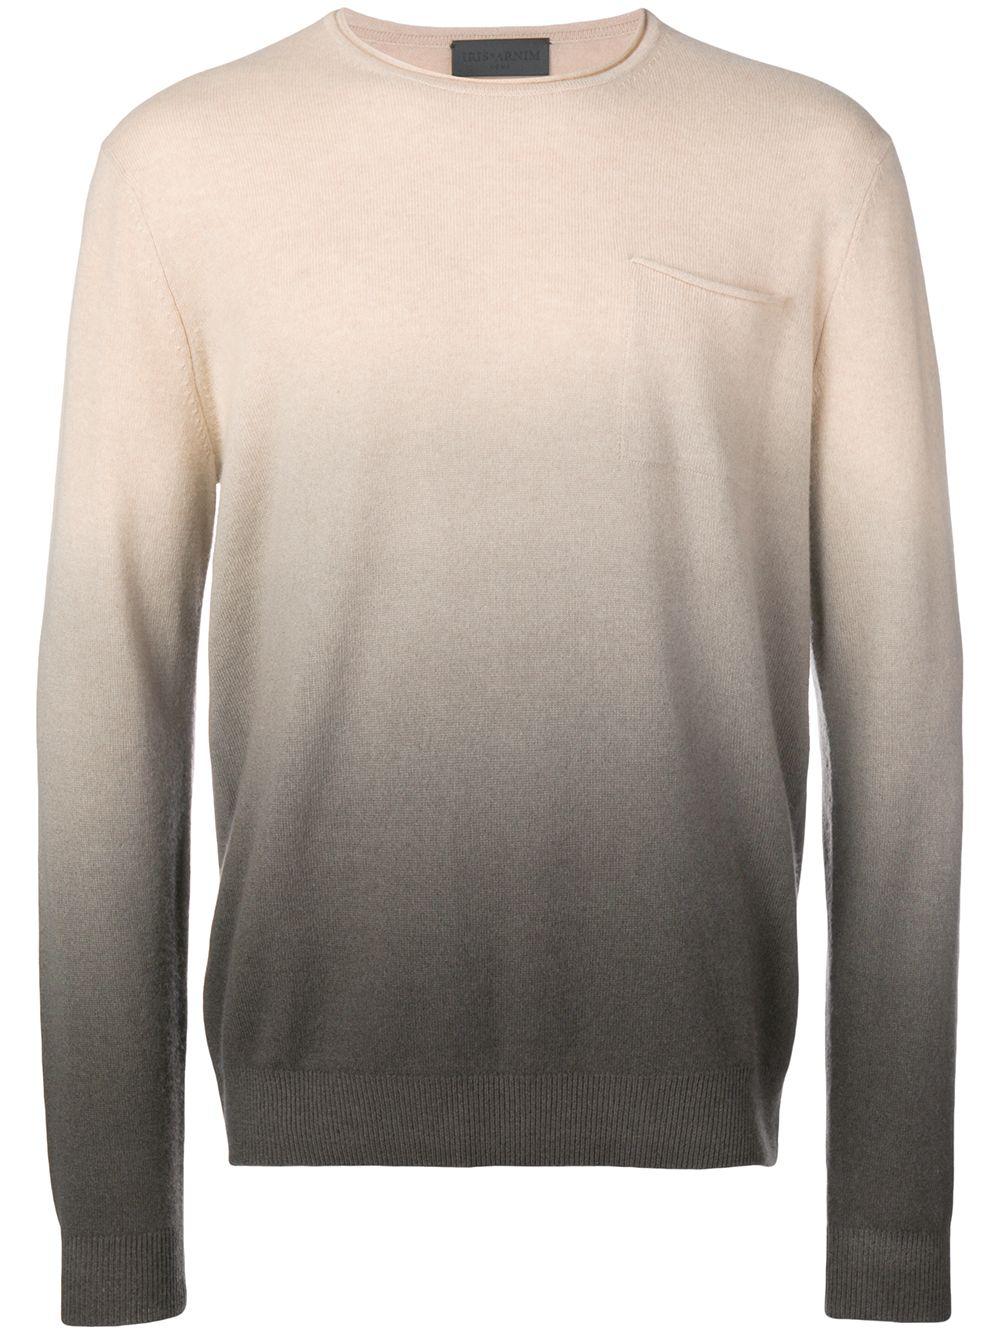 1d4d9b26637a Iris Von Arnim Ombre Fine Knit Sweater - Neutrals